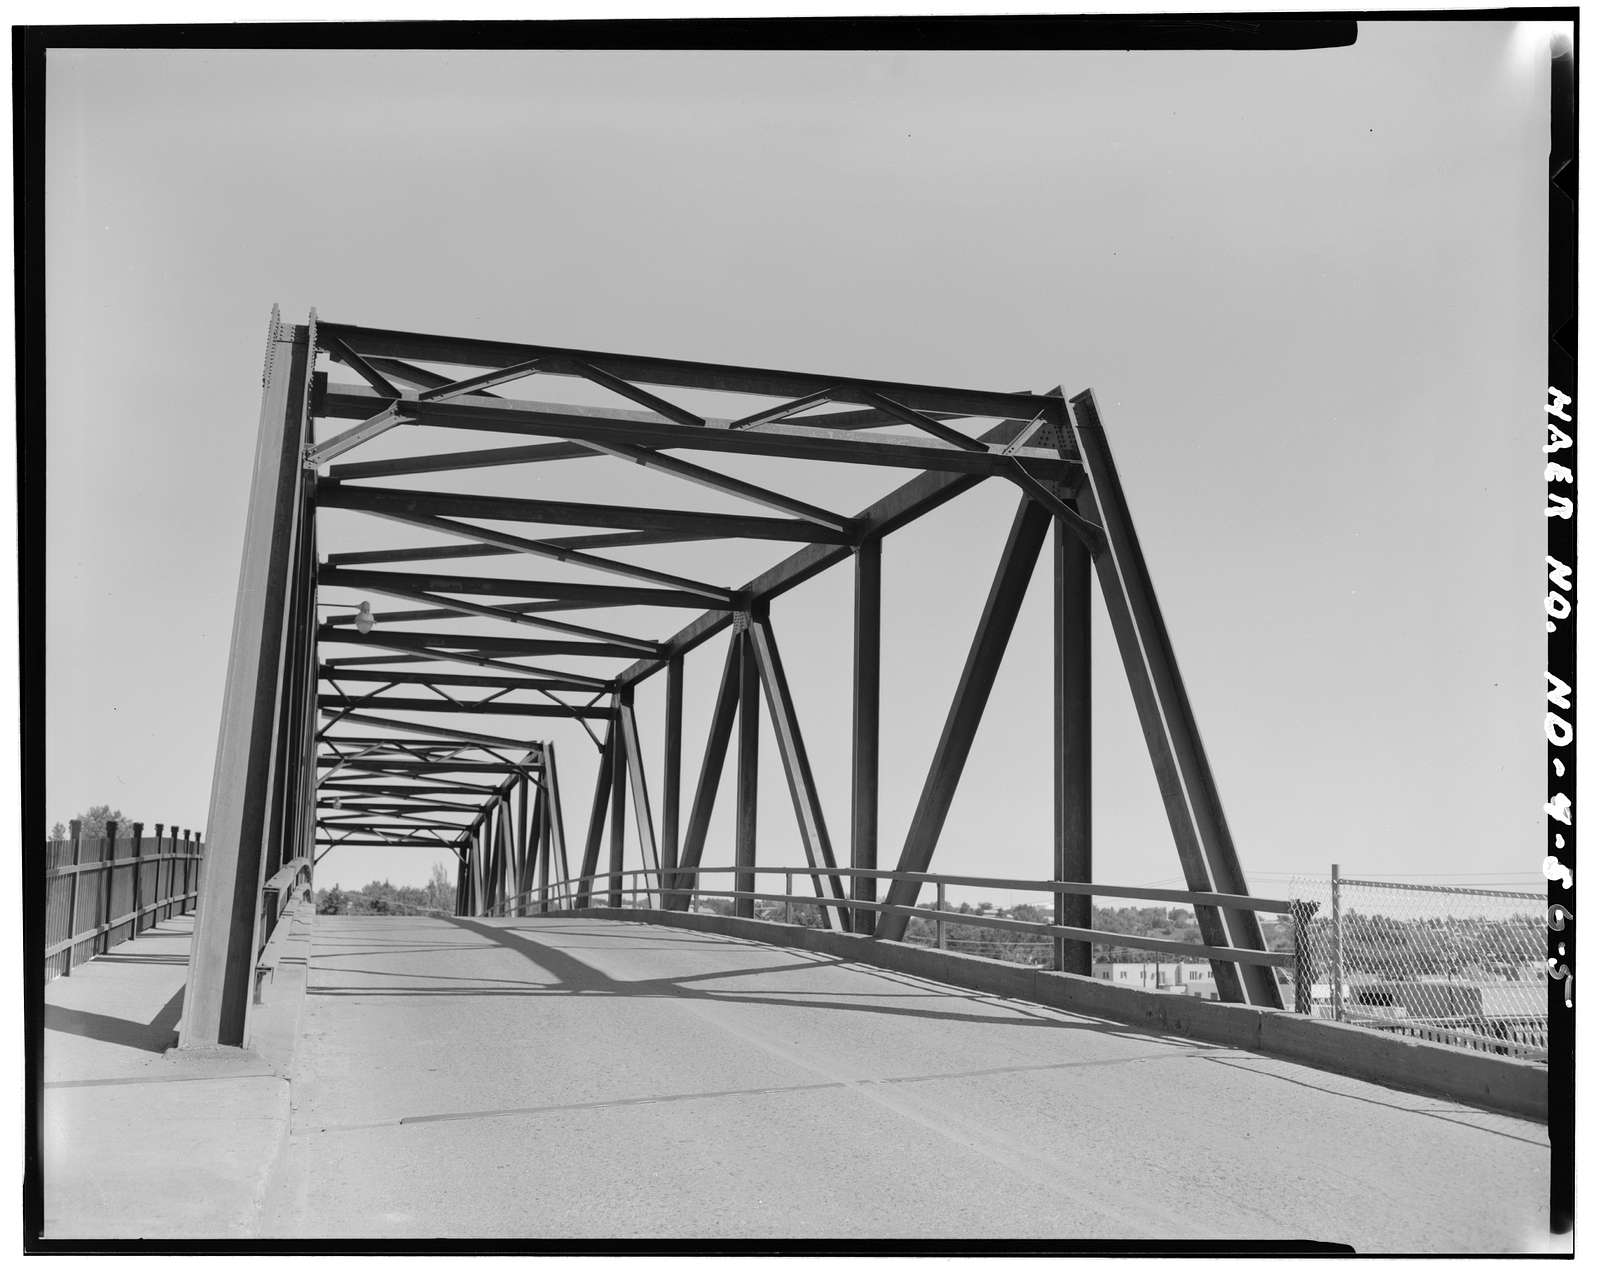 Northern Pacific Railroad Overhead Bridge, Spanning Burlington Northern Railroad, Mandan, Morton County, ND